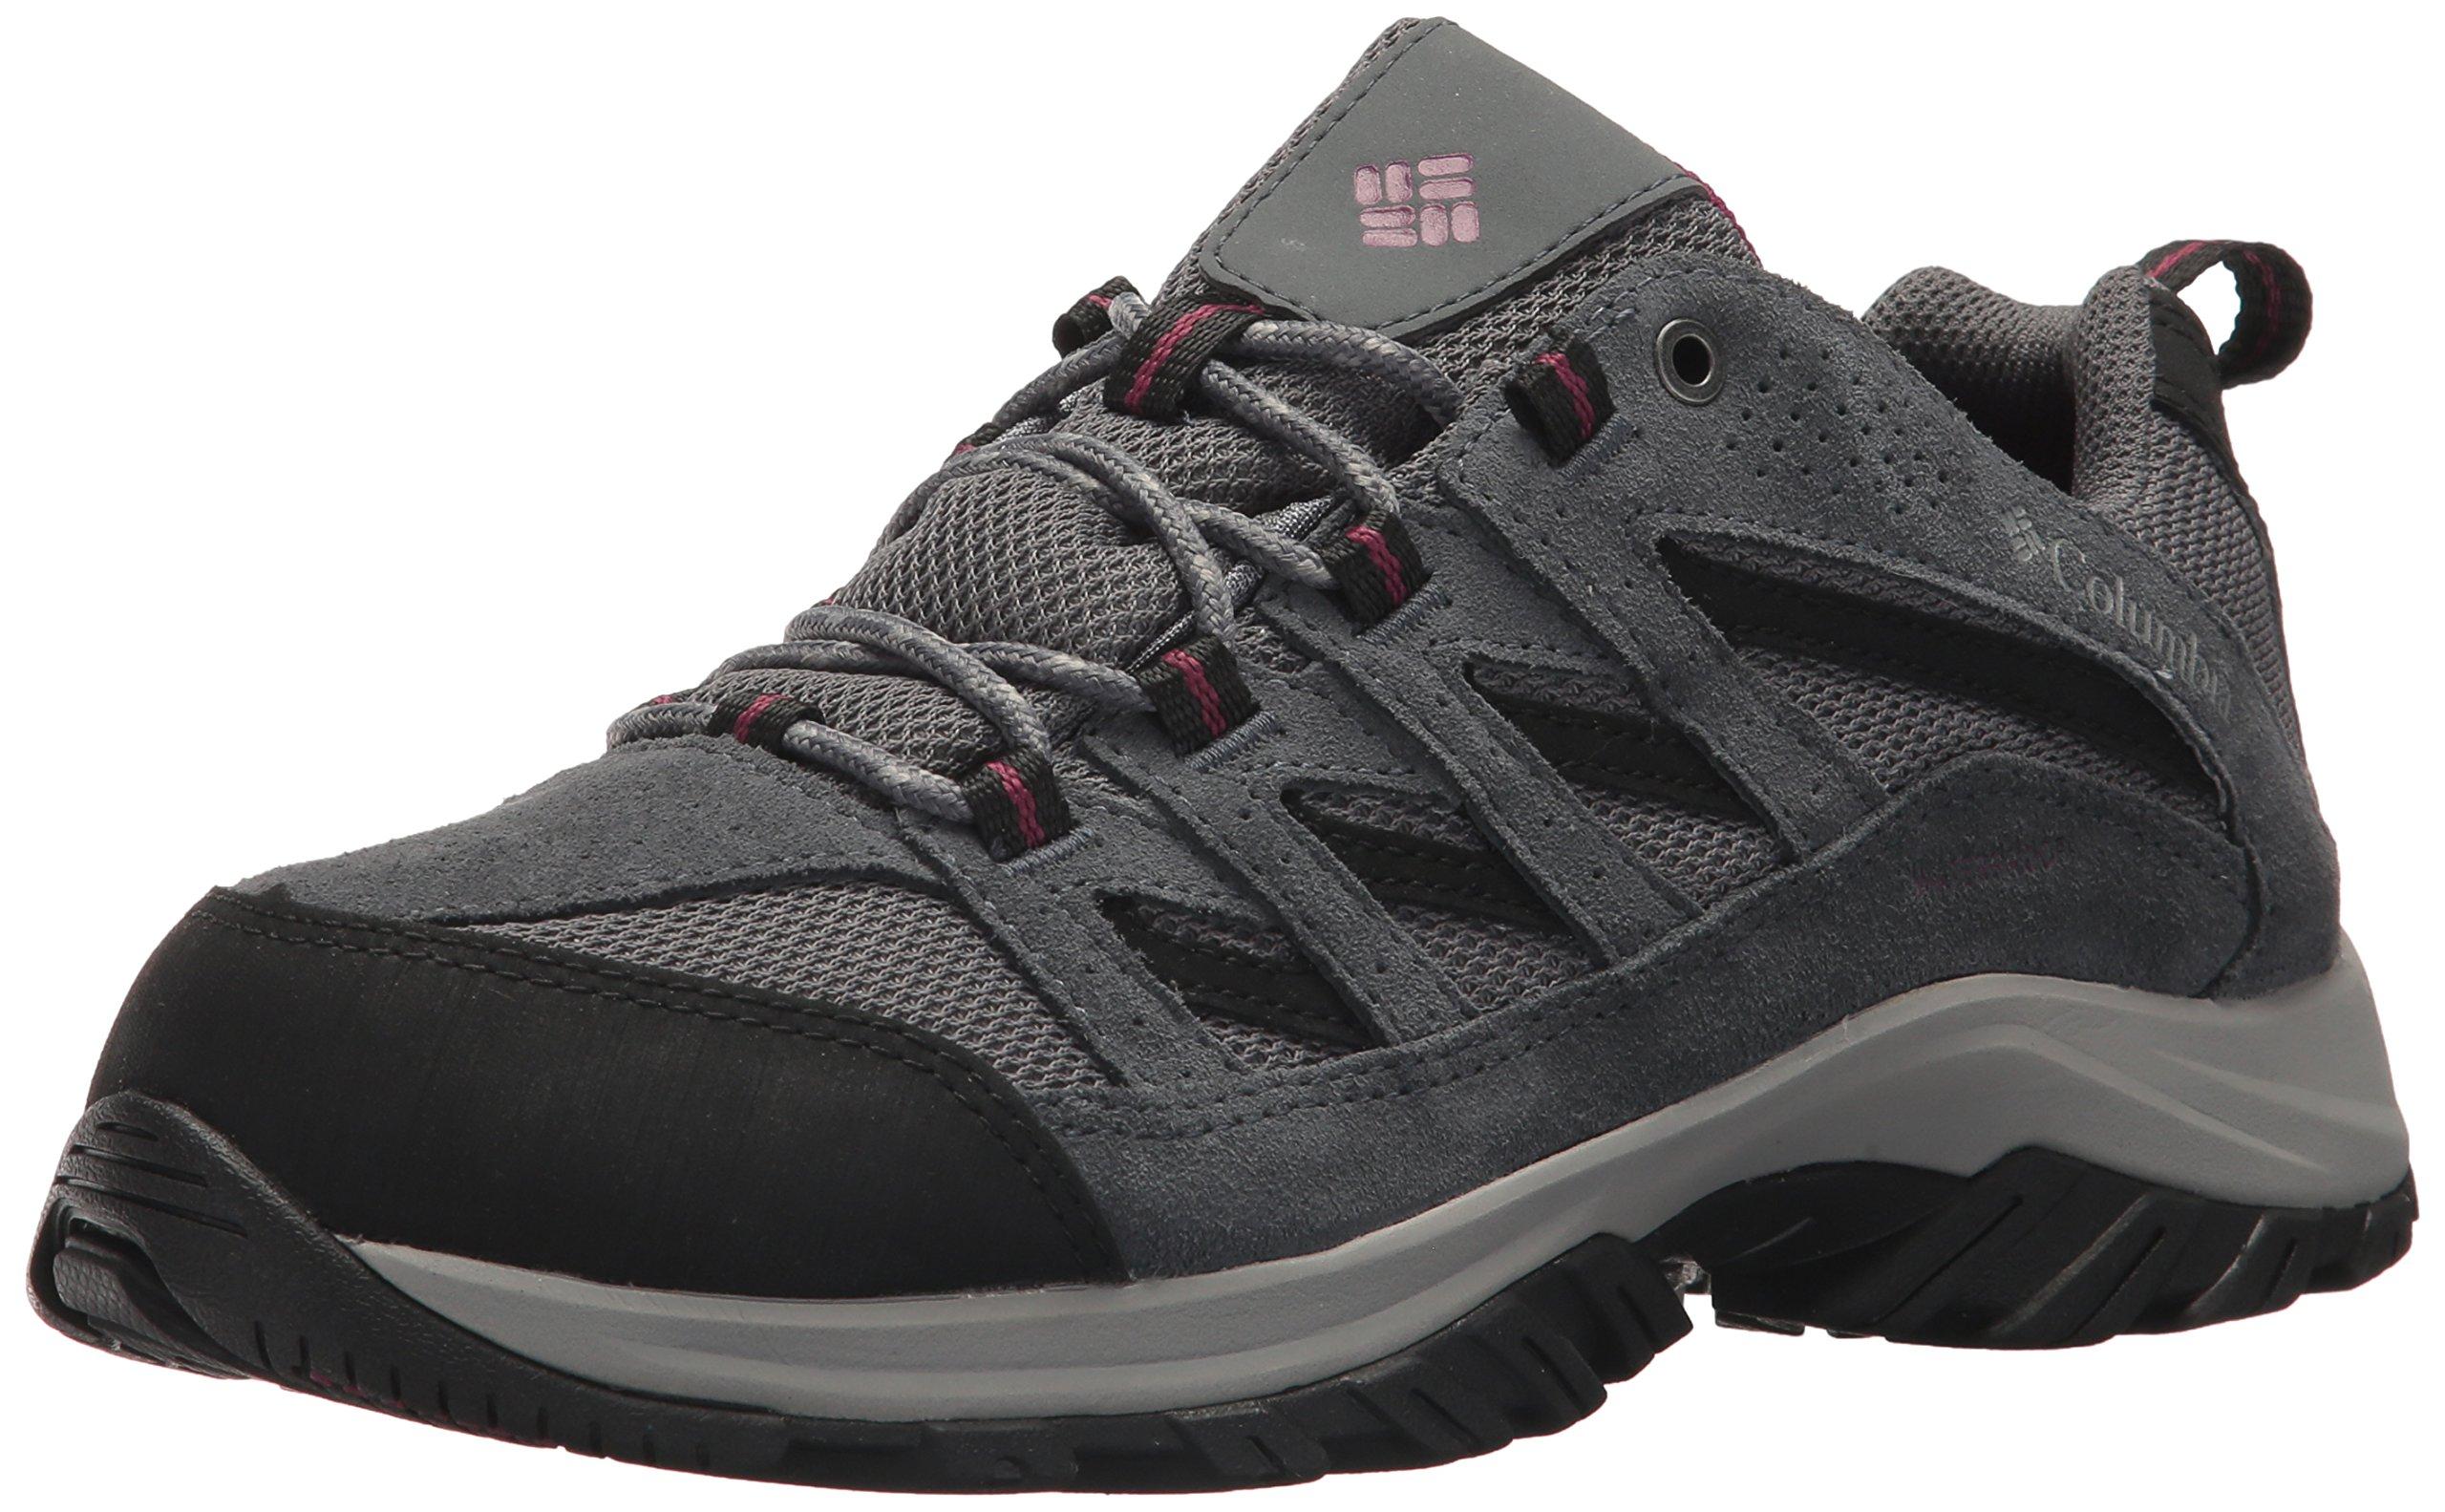 Columbia Women's Men's Crestwood Waterproof Hiking Boot, Ti Grey Steel, Dark Raspberry, 10.5 Regular US